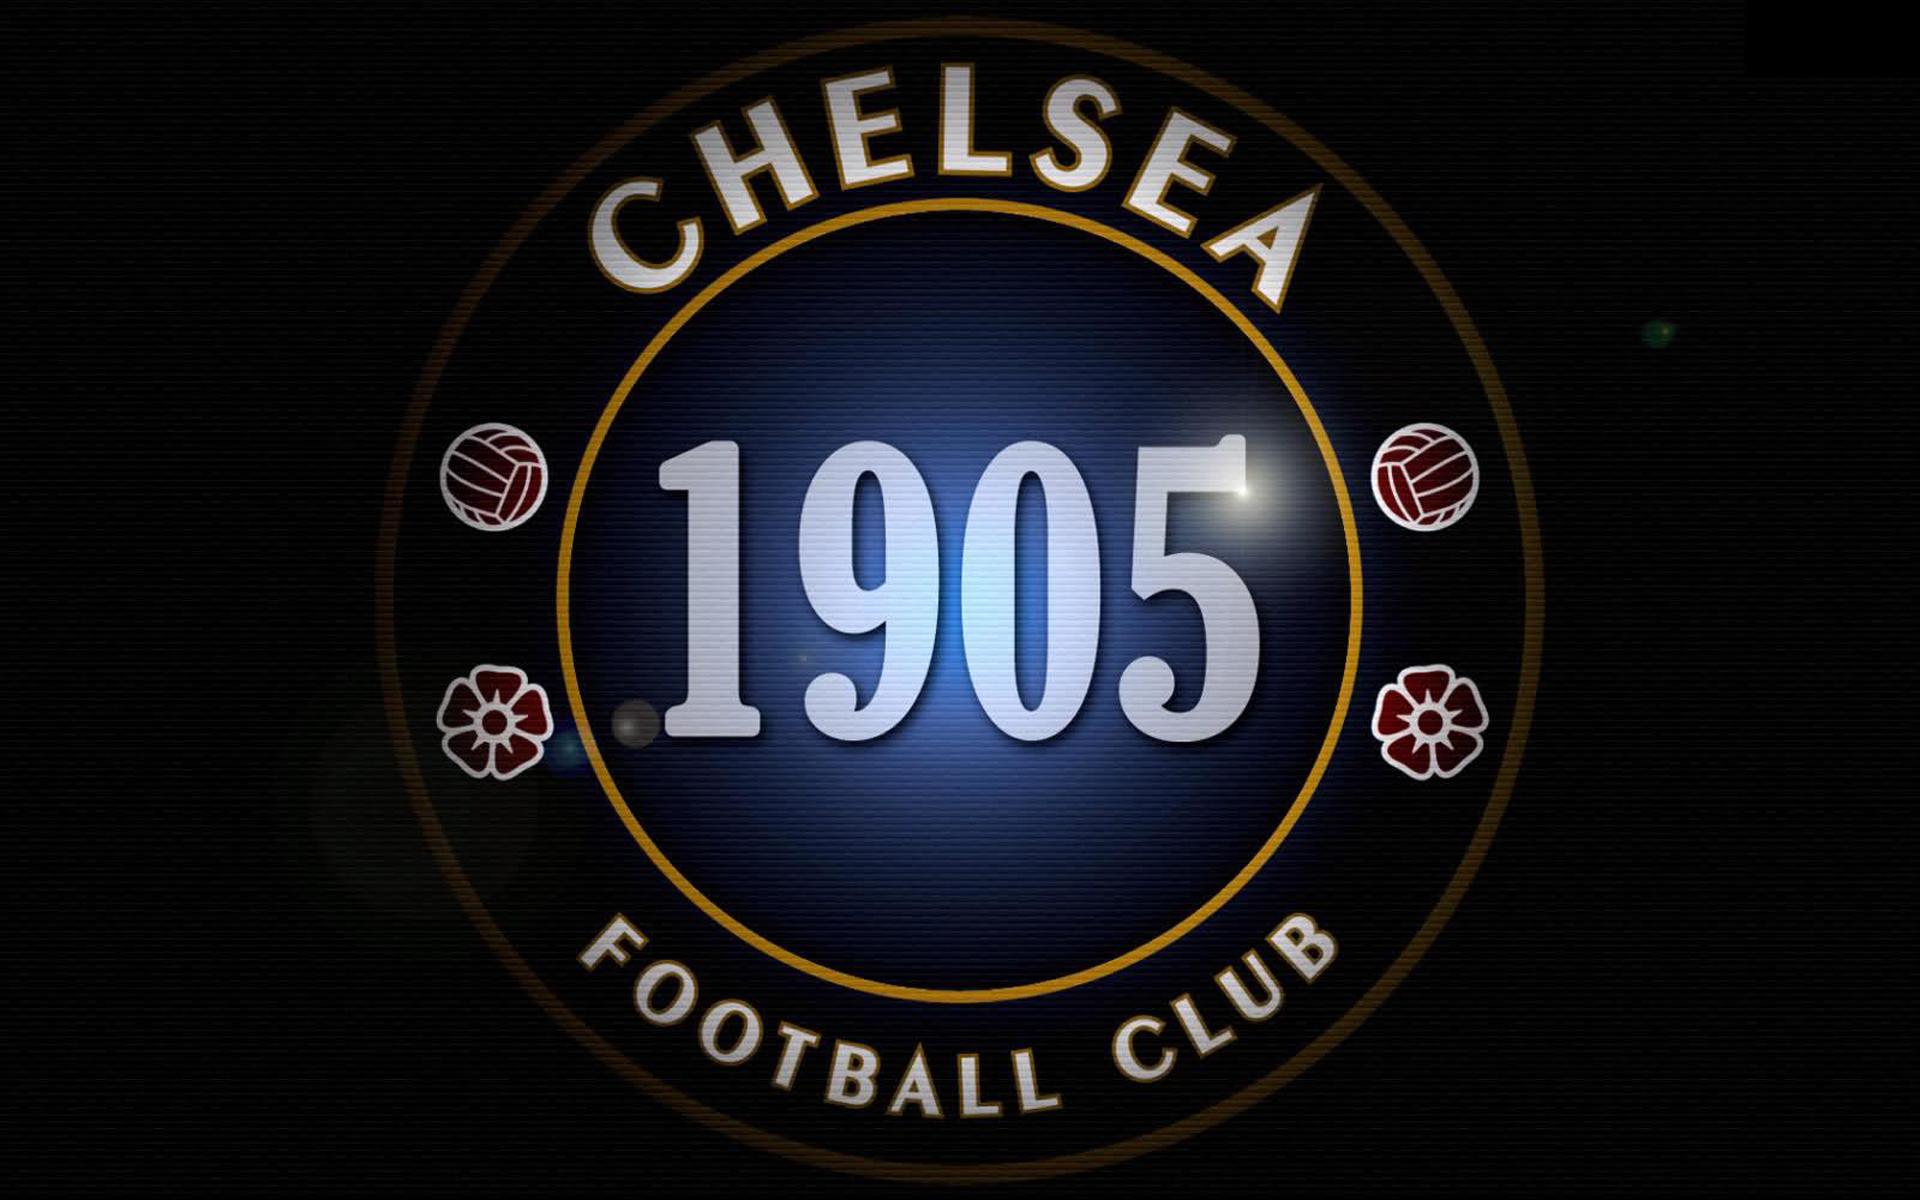 Manchester United Logo Wallpaper 3d Hd Chelsea Fc Logo Wallpapers Pixelstalk Net